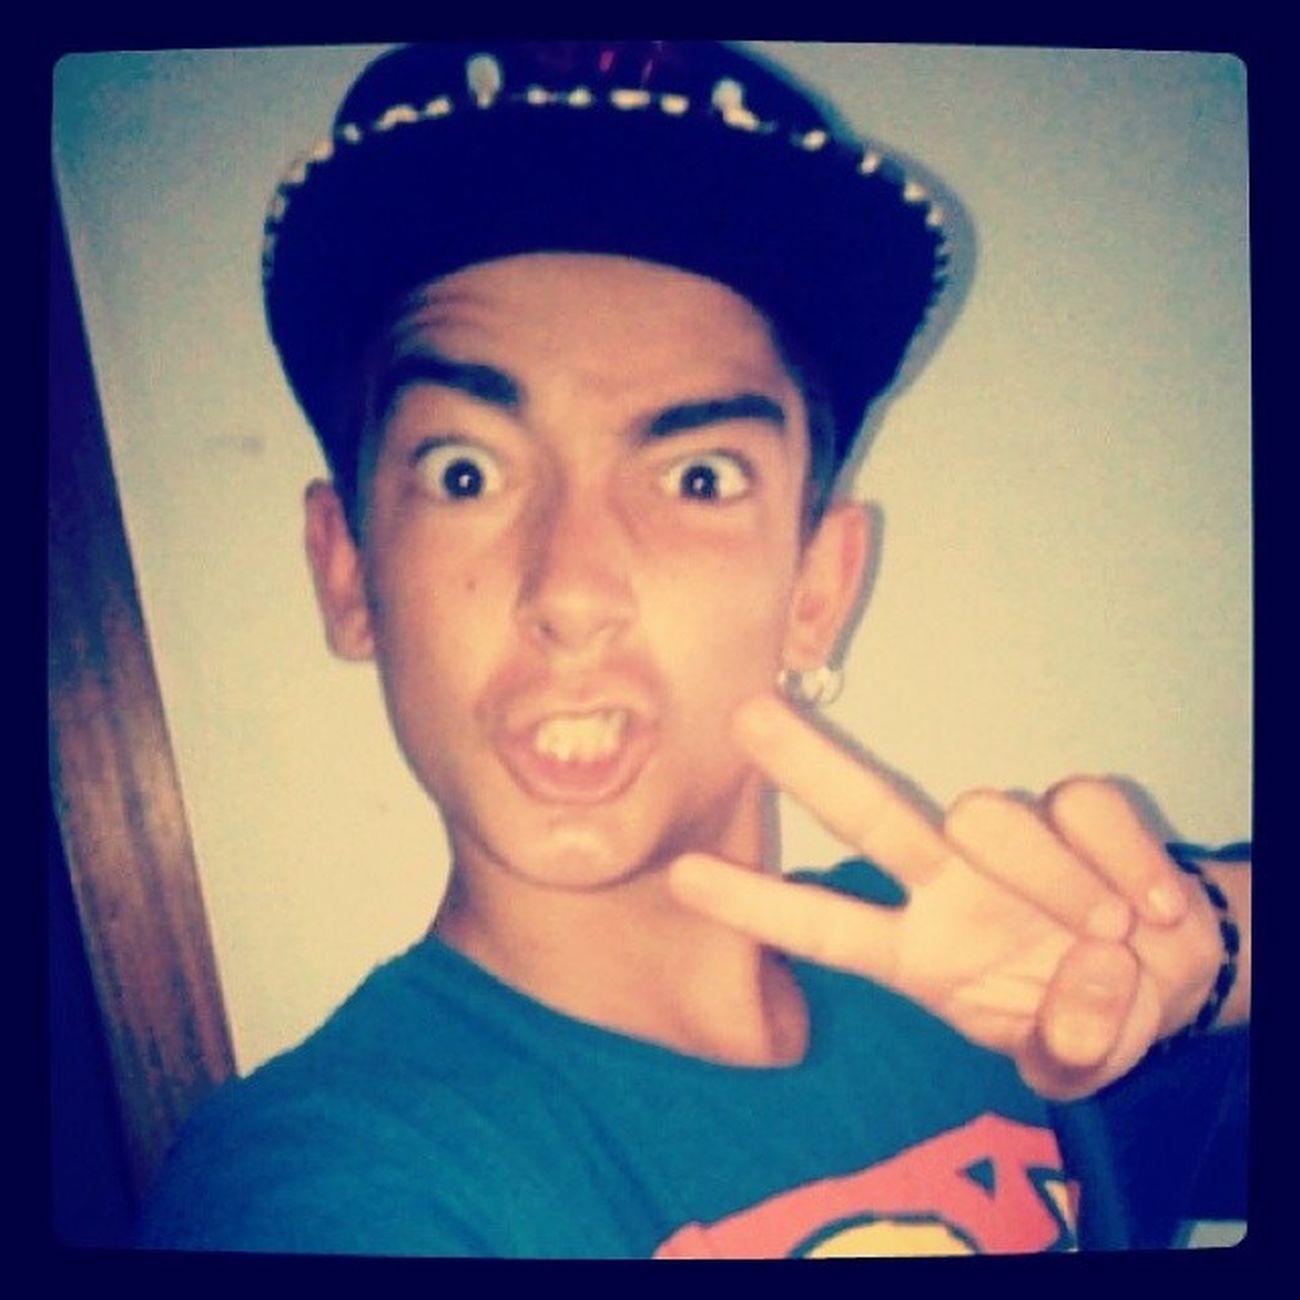 Boa tarde. Boa Tarde  Kiss Dope_shit DOPE Snapback Peace And Love Superman Shirt Two Fingers Swag Cute Hot Summer August Ansioso Pelo Treino Amanha Season  Greenville Abreijos